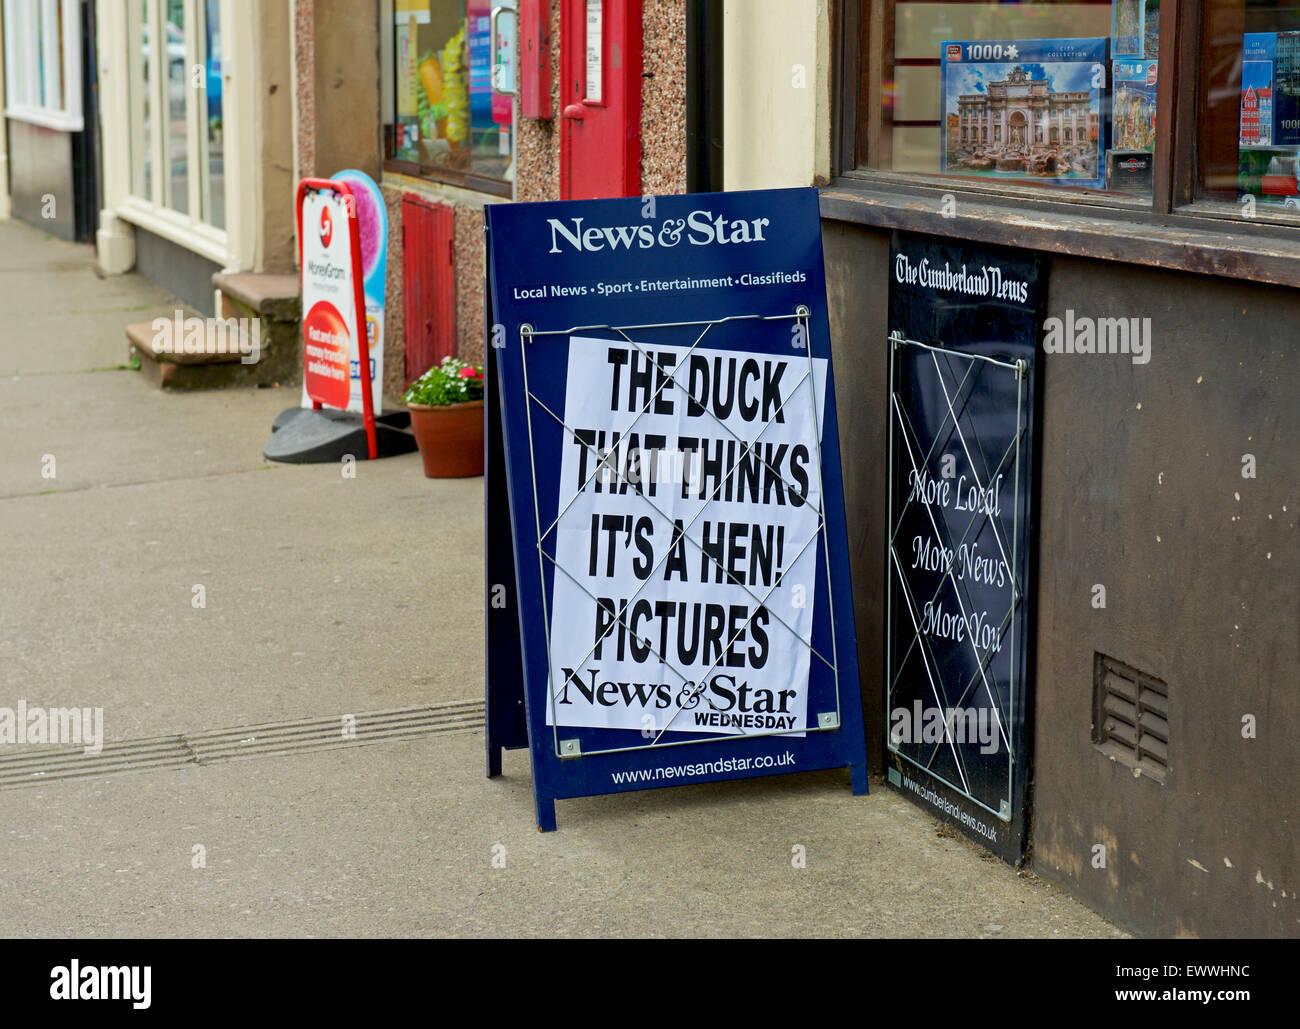 newspaper-headline-on-sign-outside-newsagent-shop-england-uk-EWWHNC.jpg